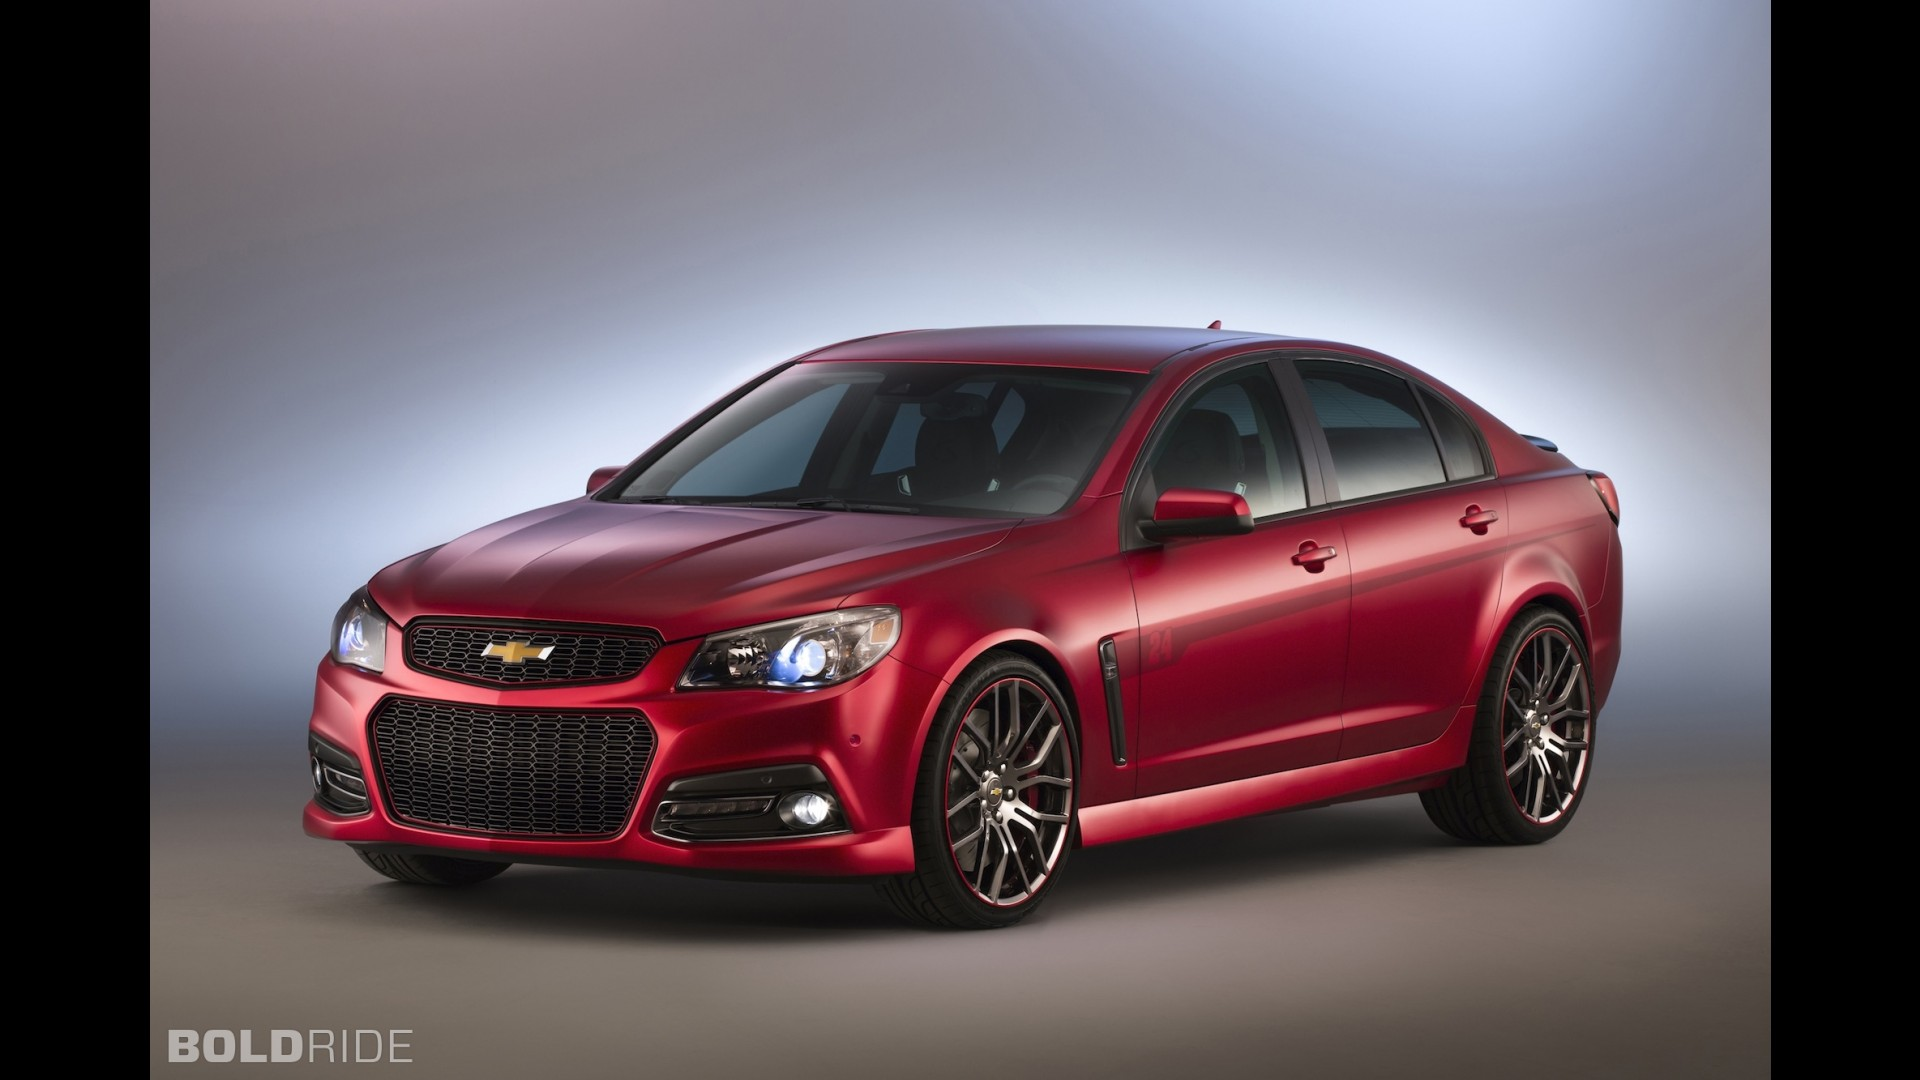 2014 Chevrolet Ss Sedan Photos And Info News Car And